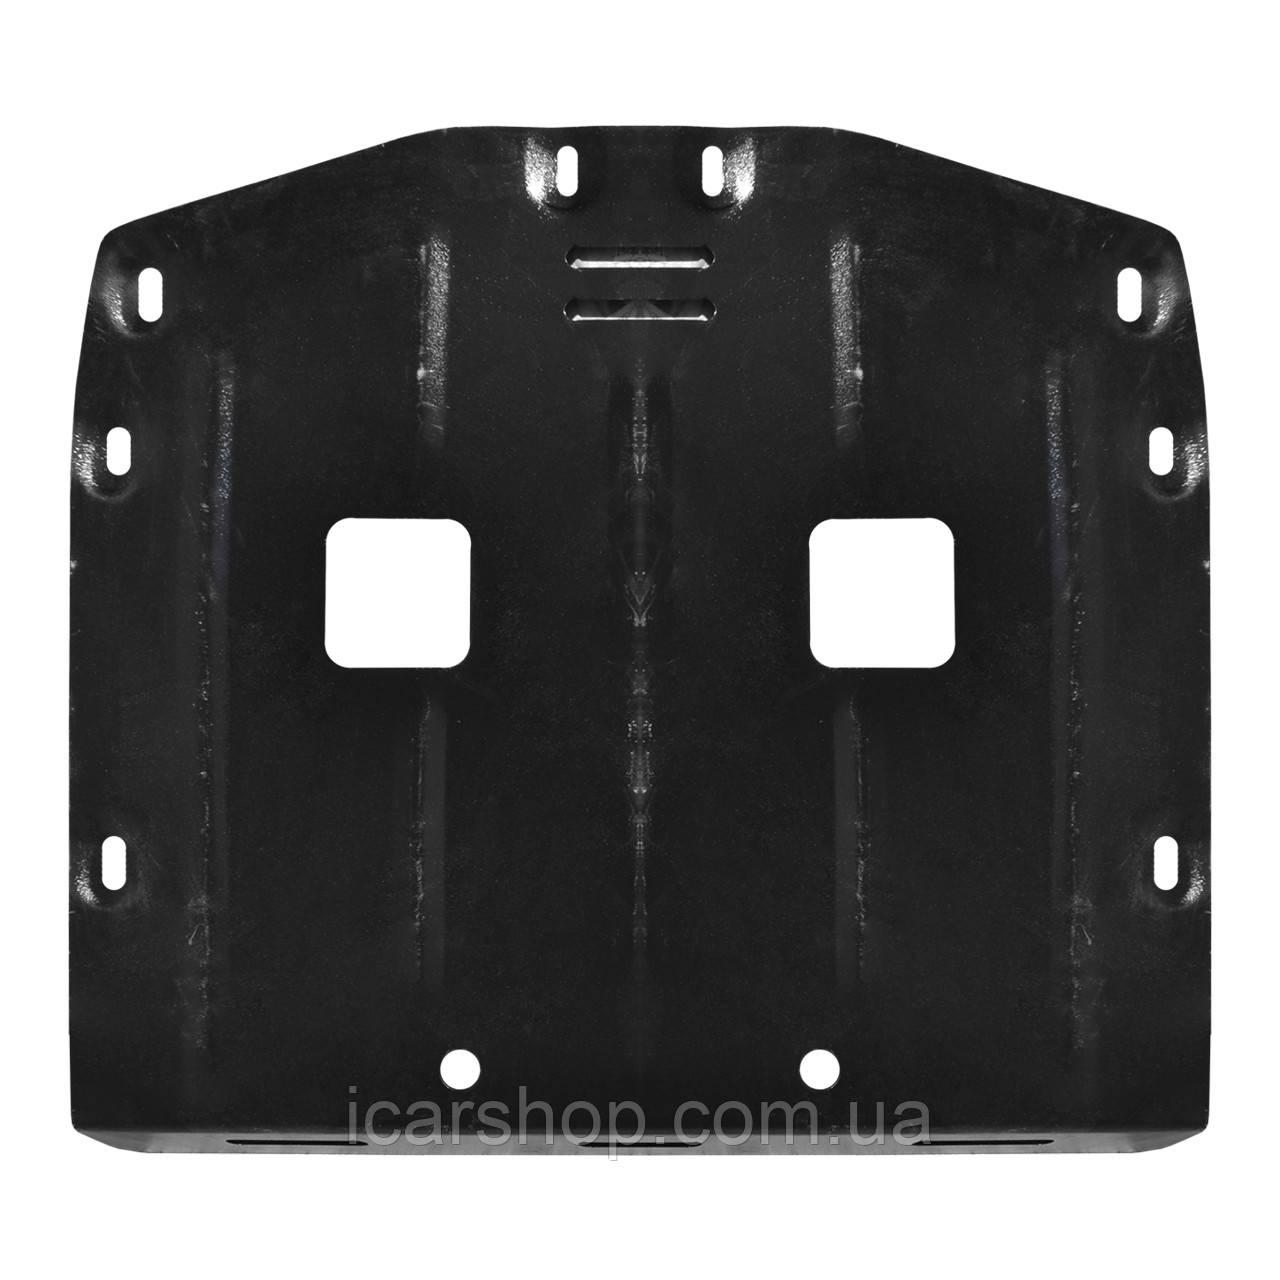 Захист Двигуна / КПП Honda CR-V 02-06 Titan